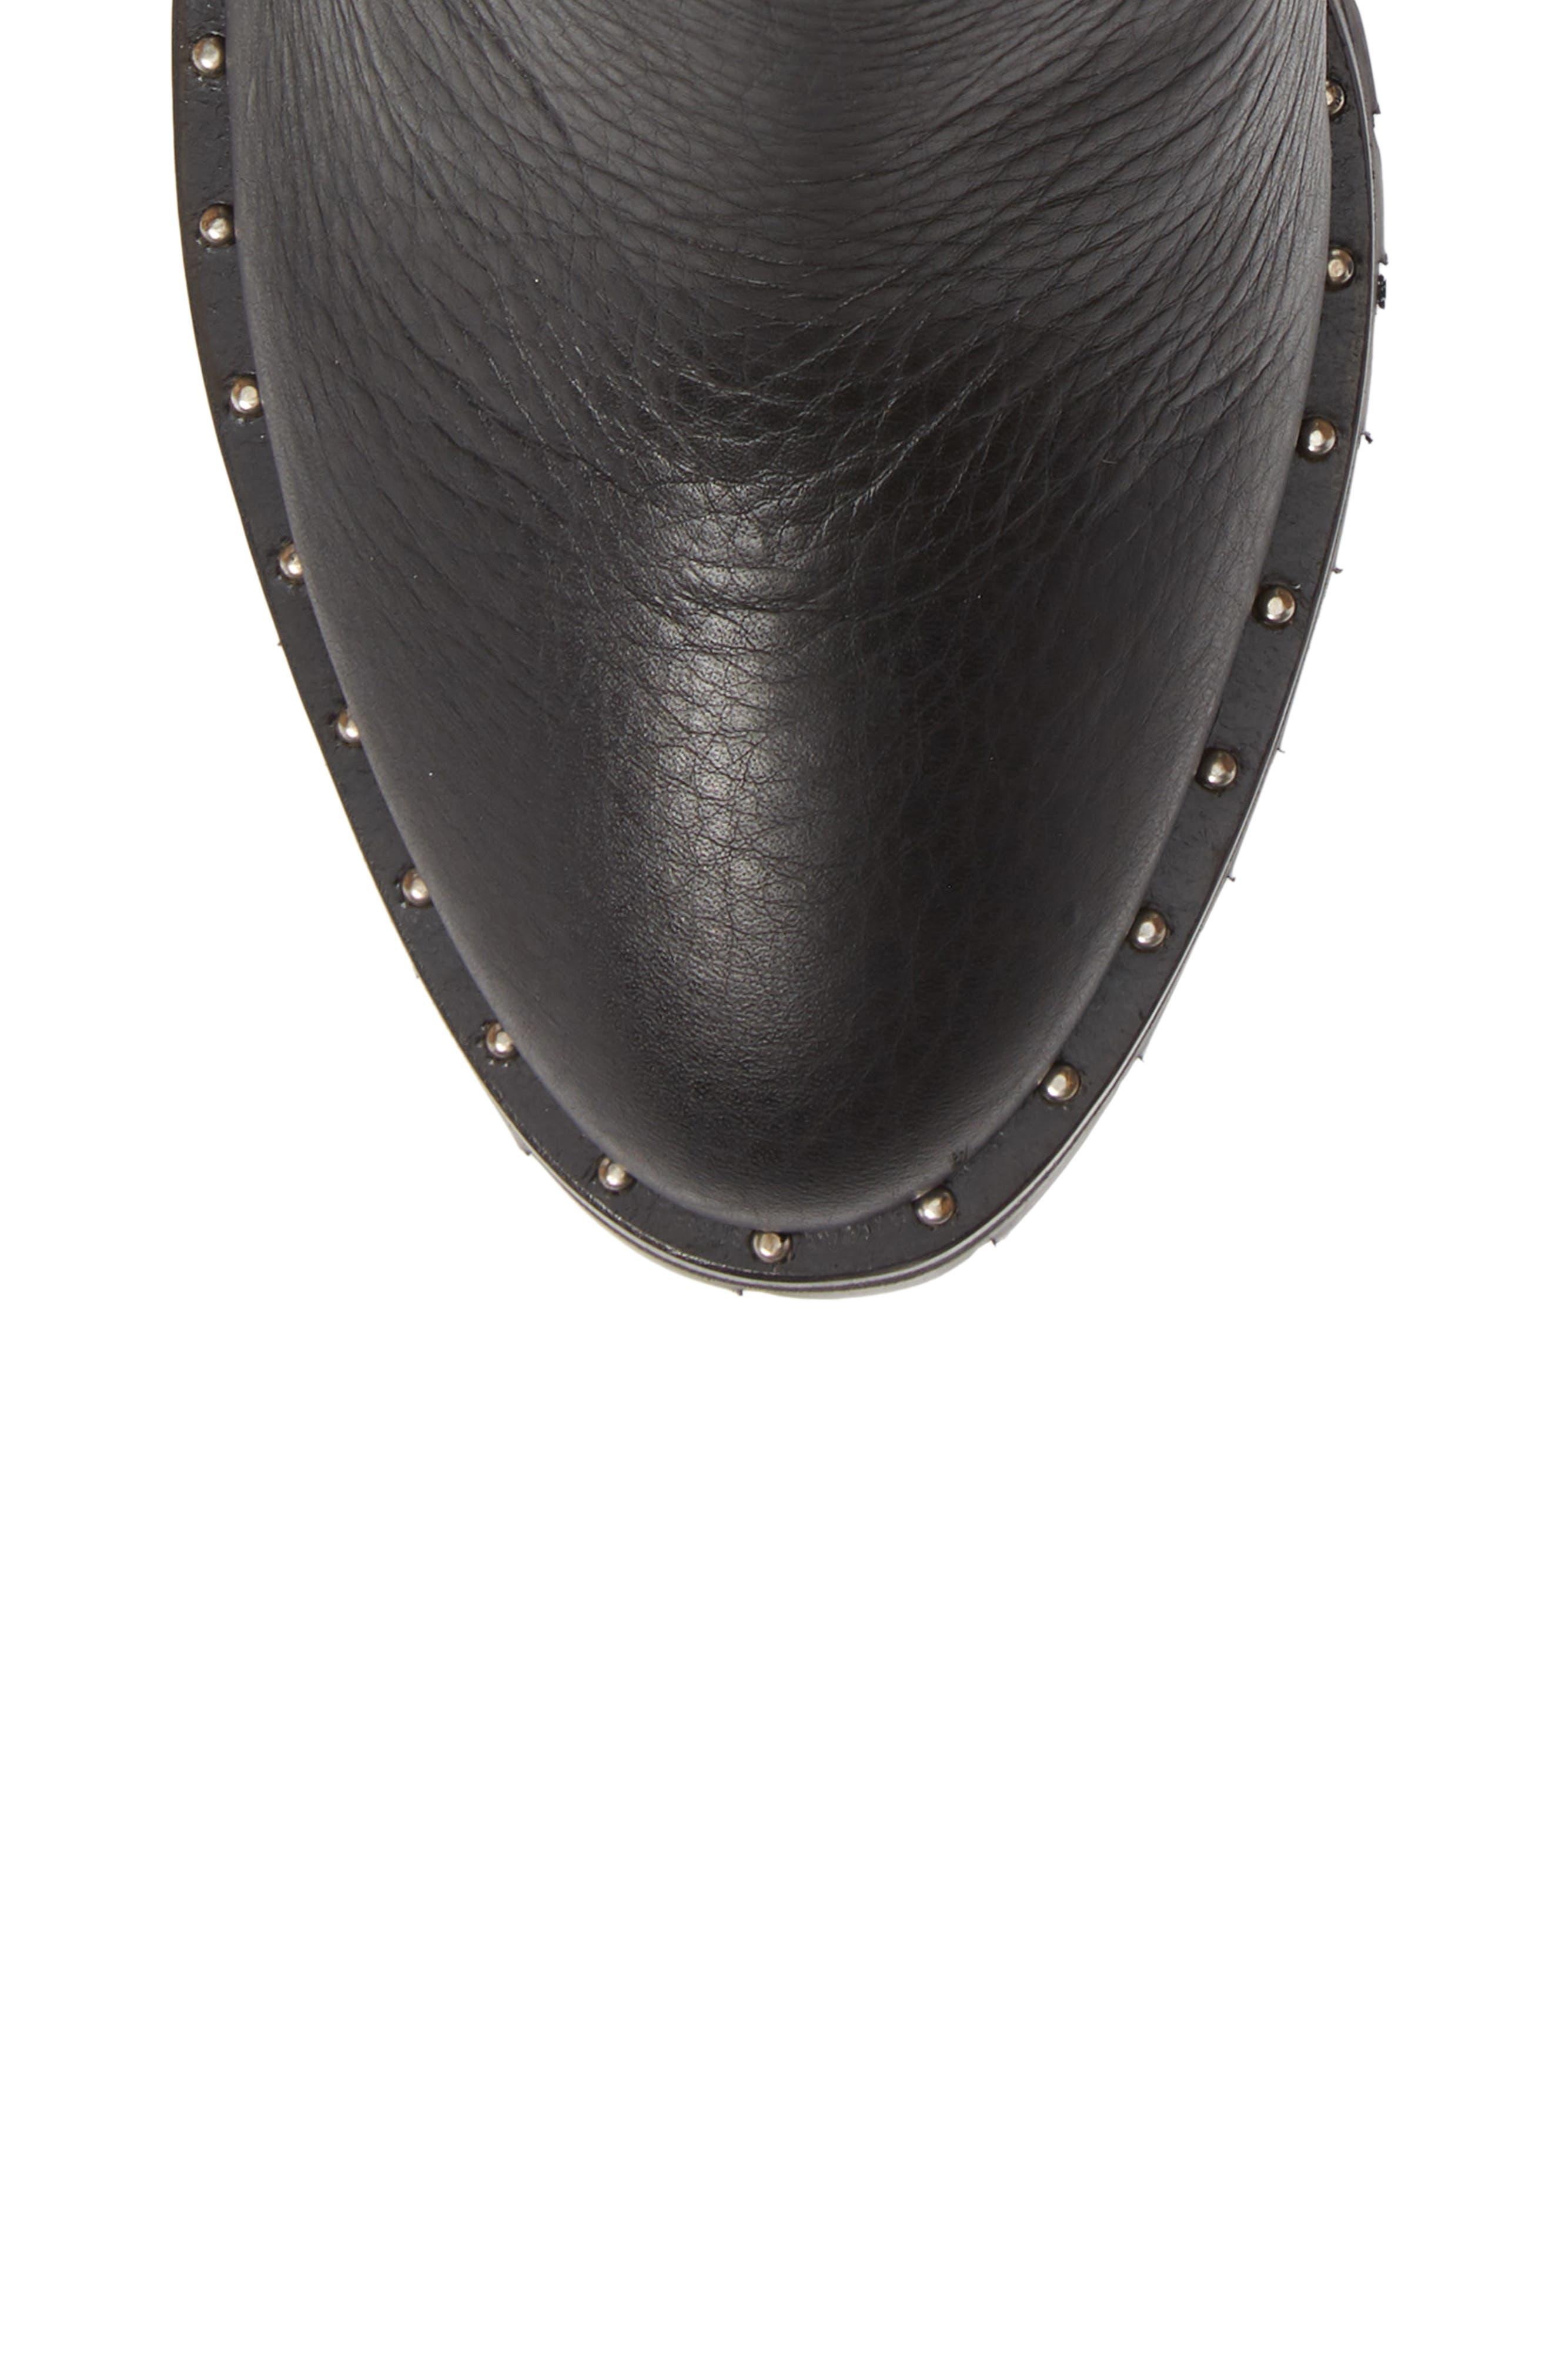 REBECCA MINKOFF, Edolie Studded Platform Bootie, Alternate thumbnail 5, color, BLACK LEATHER